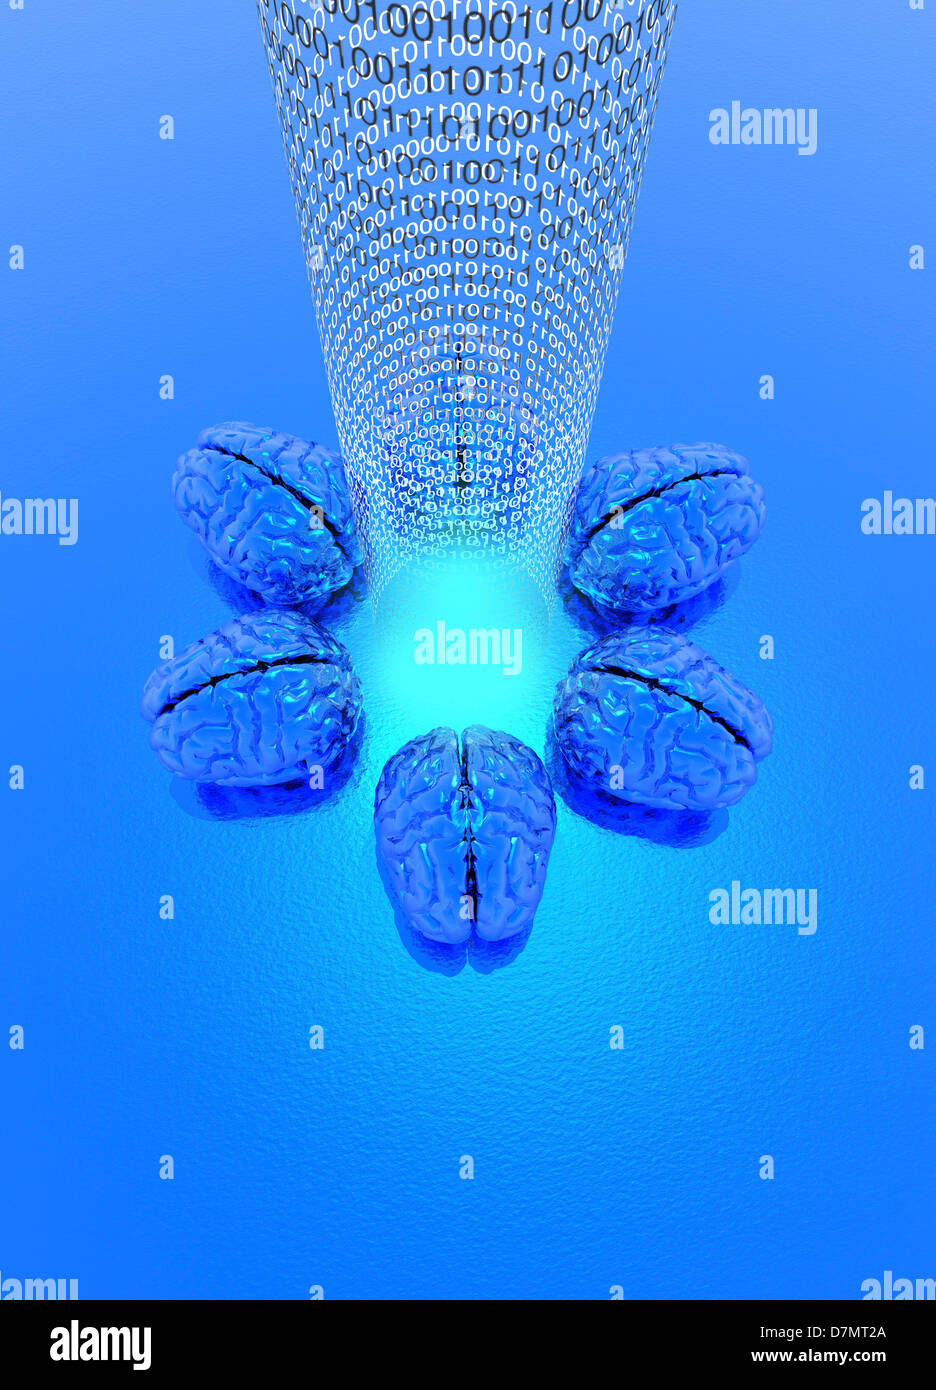 Brain mapping, conceptual artwork - Stock Image